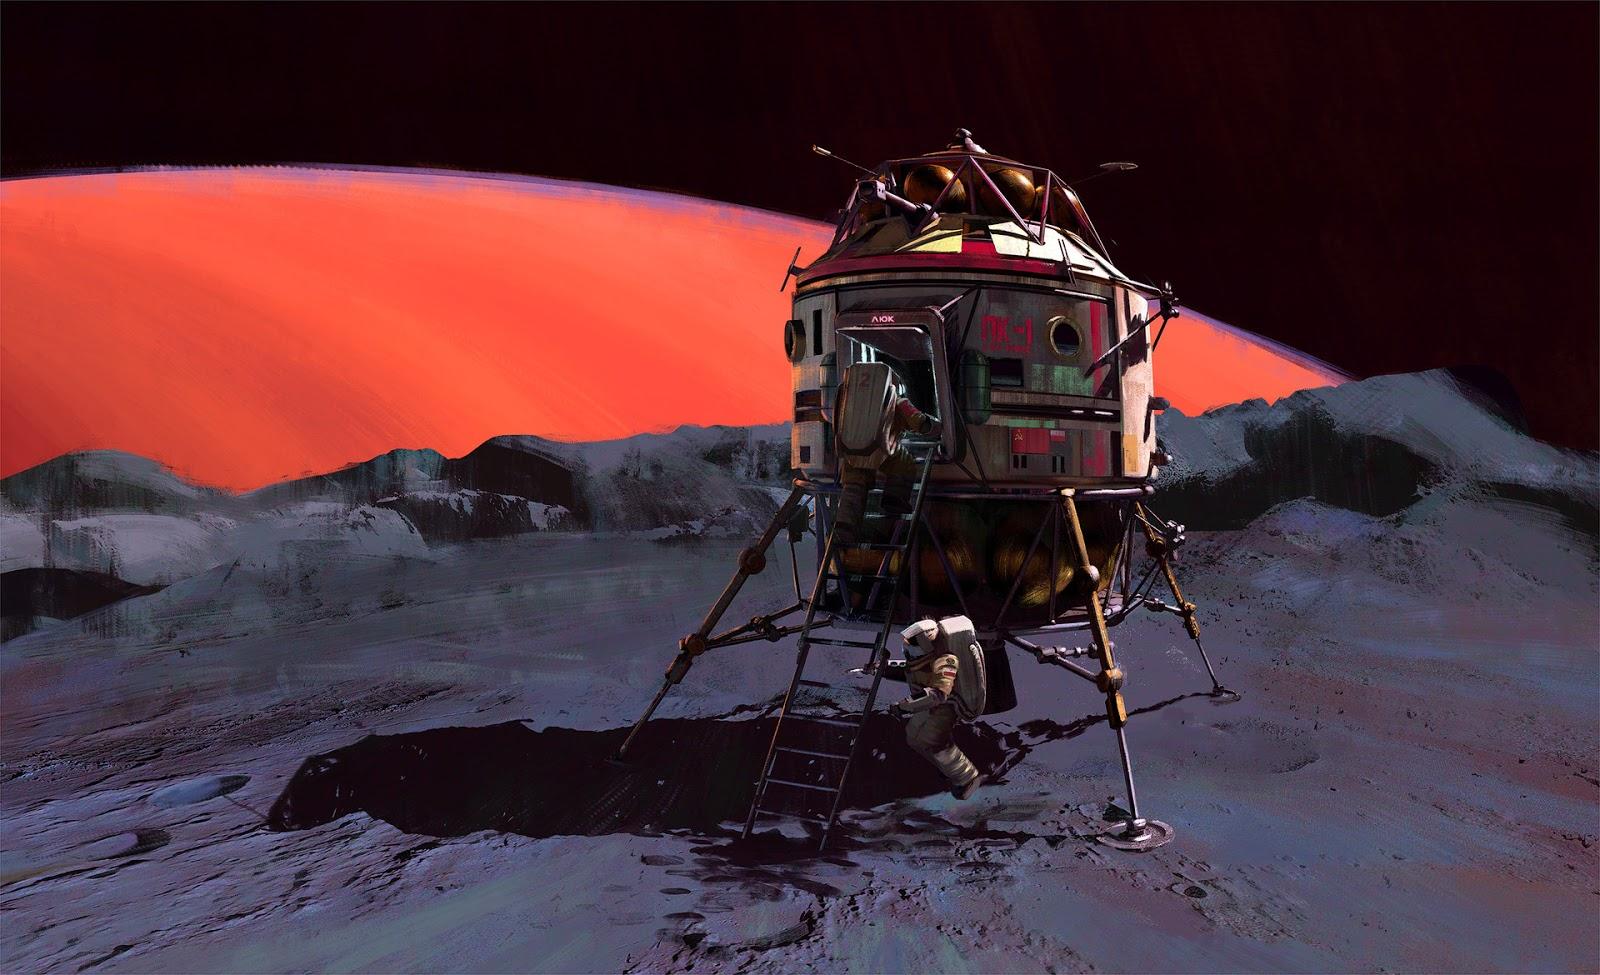 Soviet lander on Phobos by Maciej Rebisz